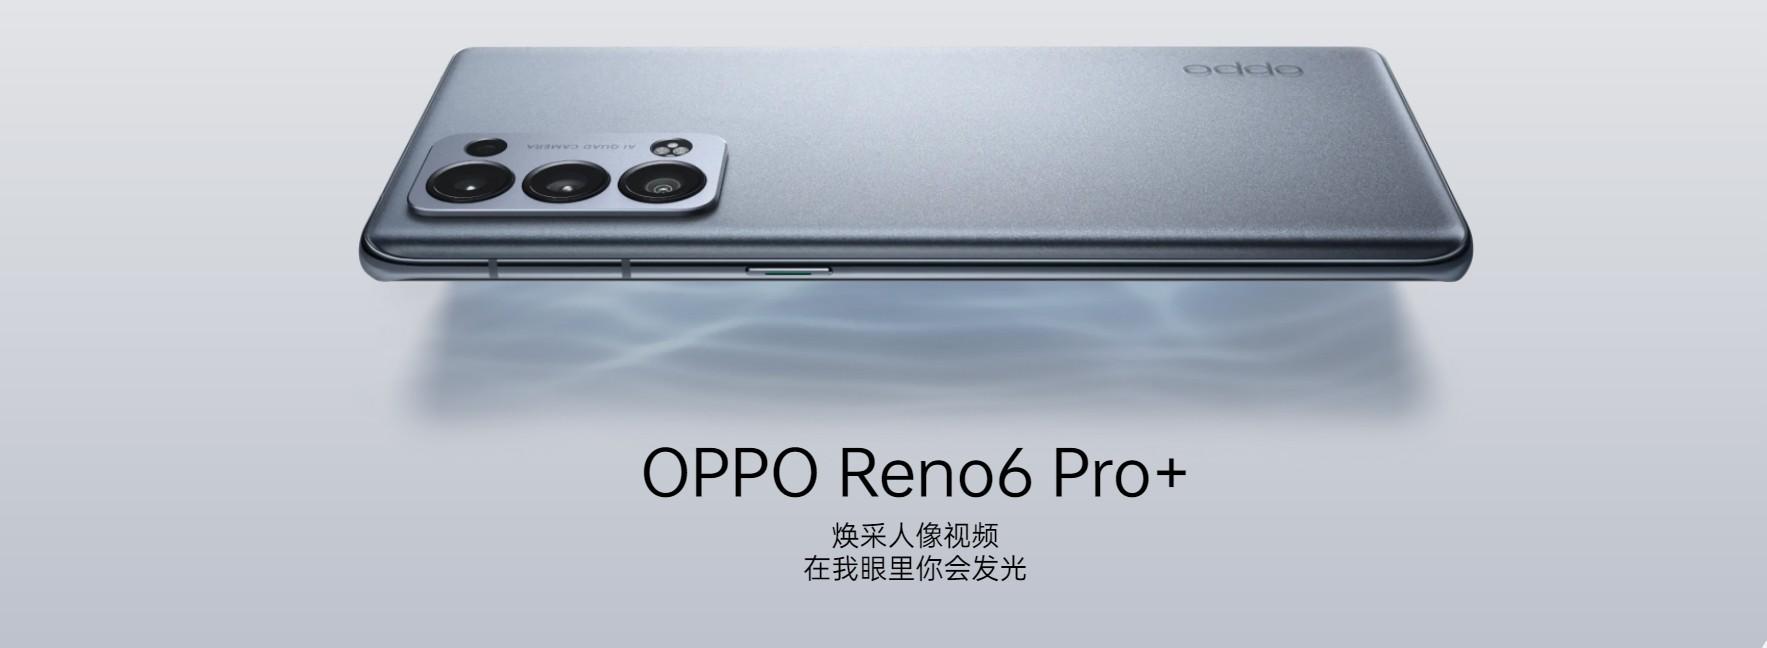 OPPO Reno6 Pro+�����D�p